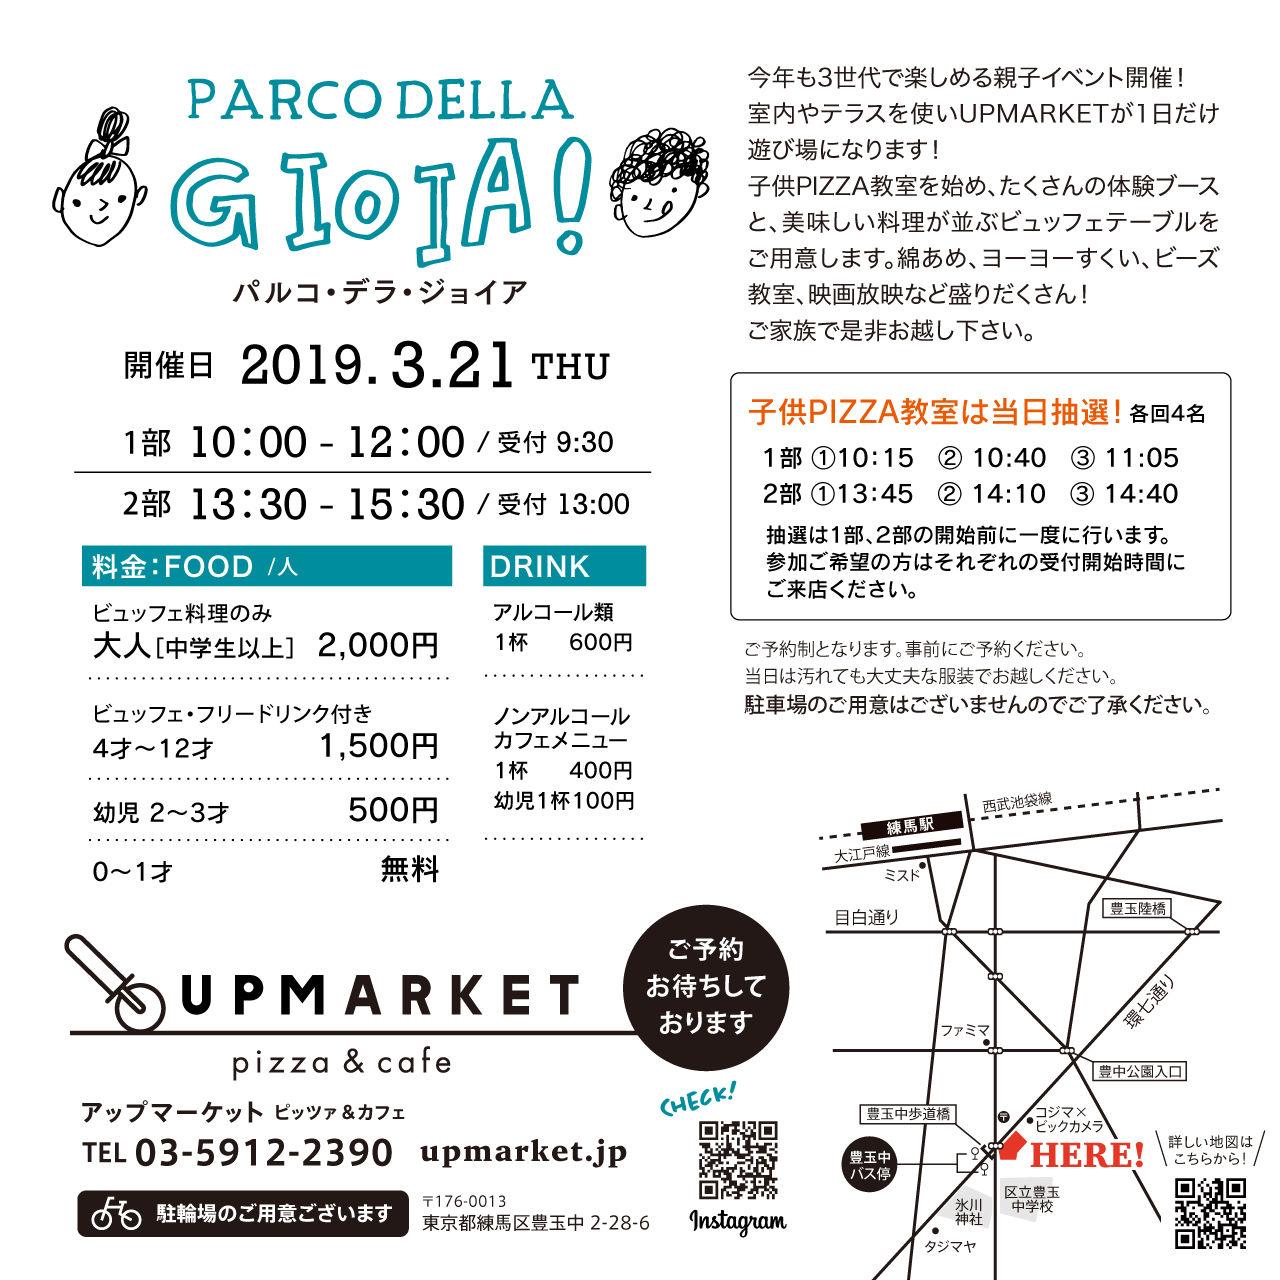 upm_1903_parco_2.jpg